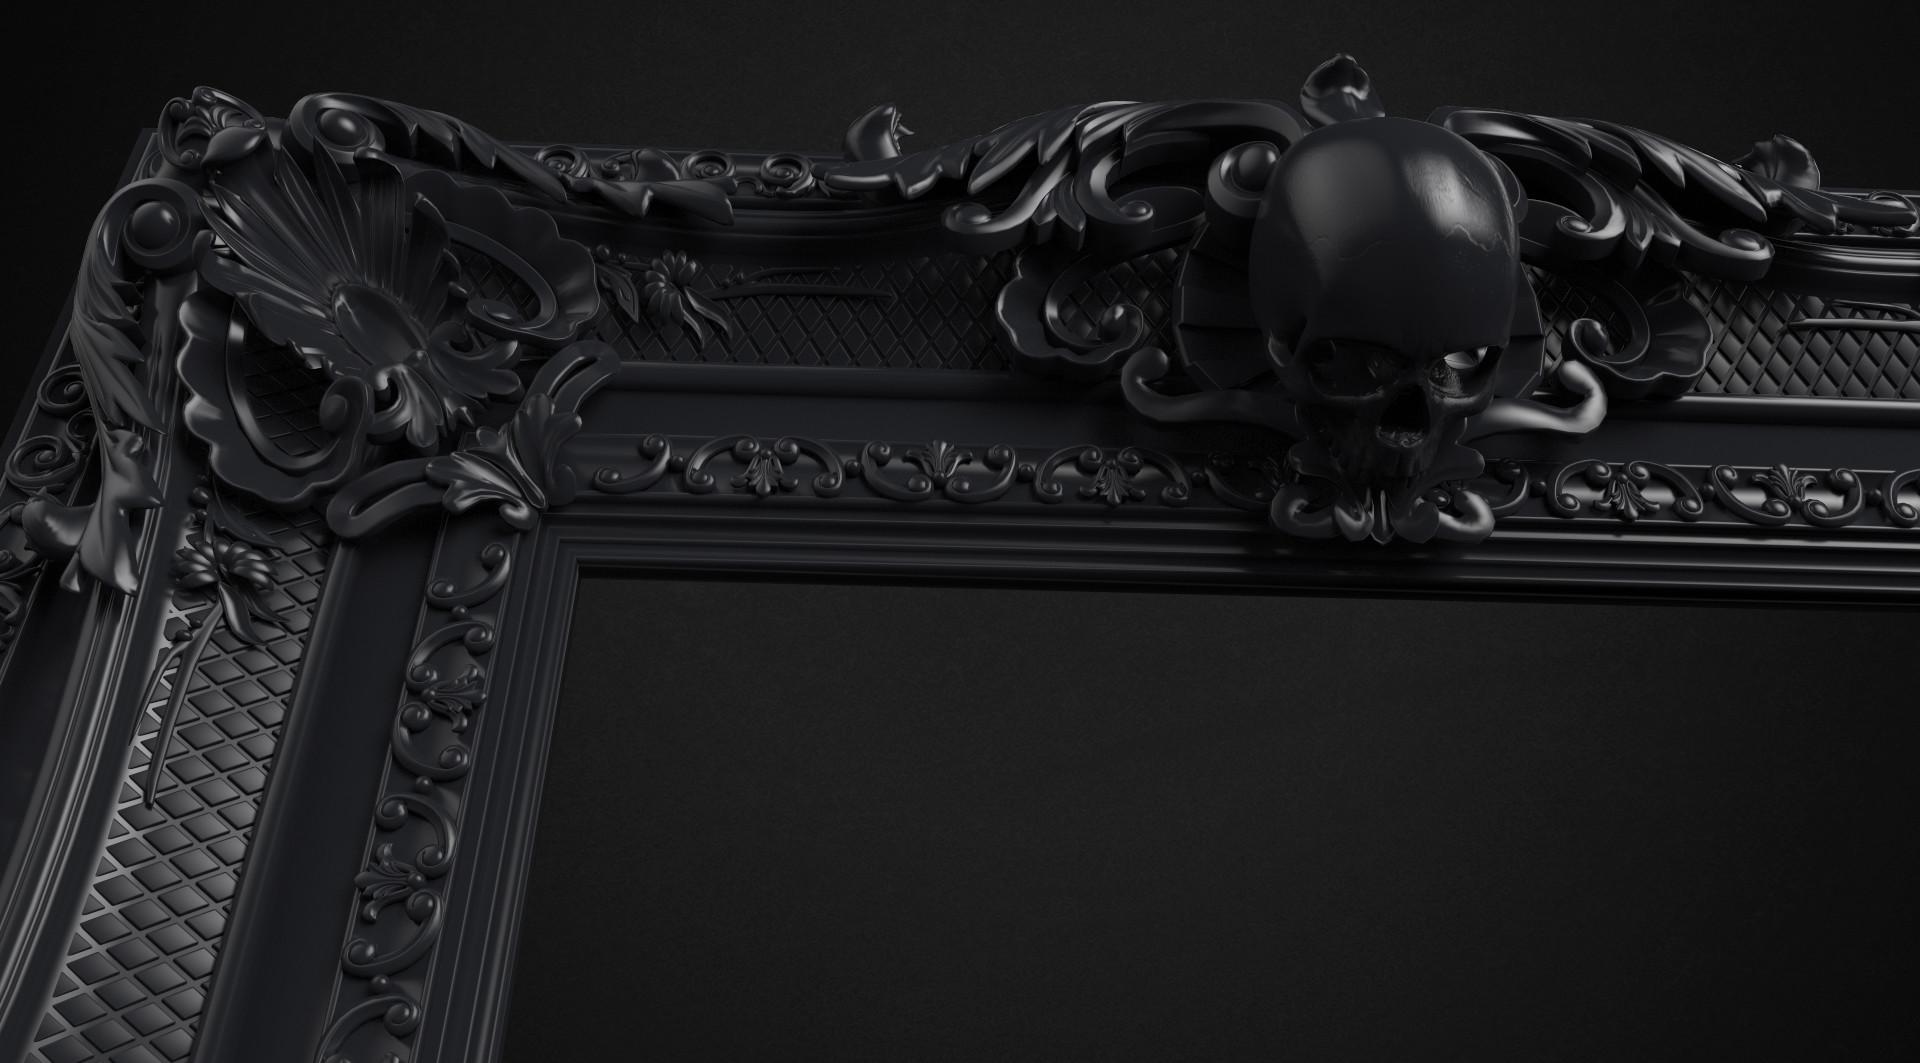 ArtStation - Skull Frame - 3D Printing Project, Binh Le